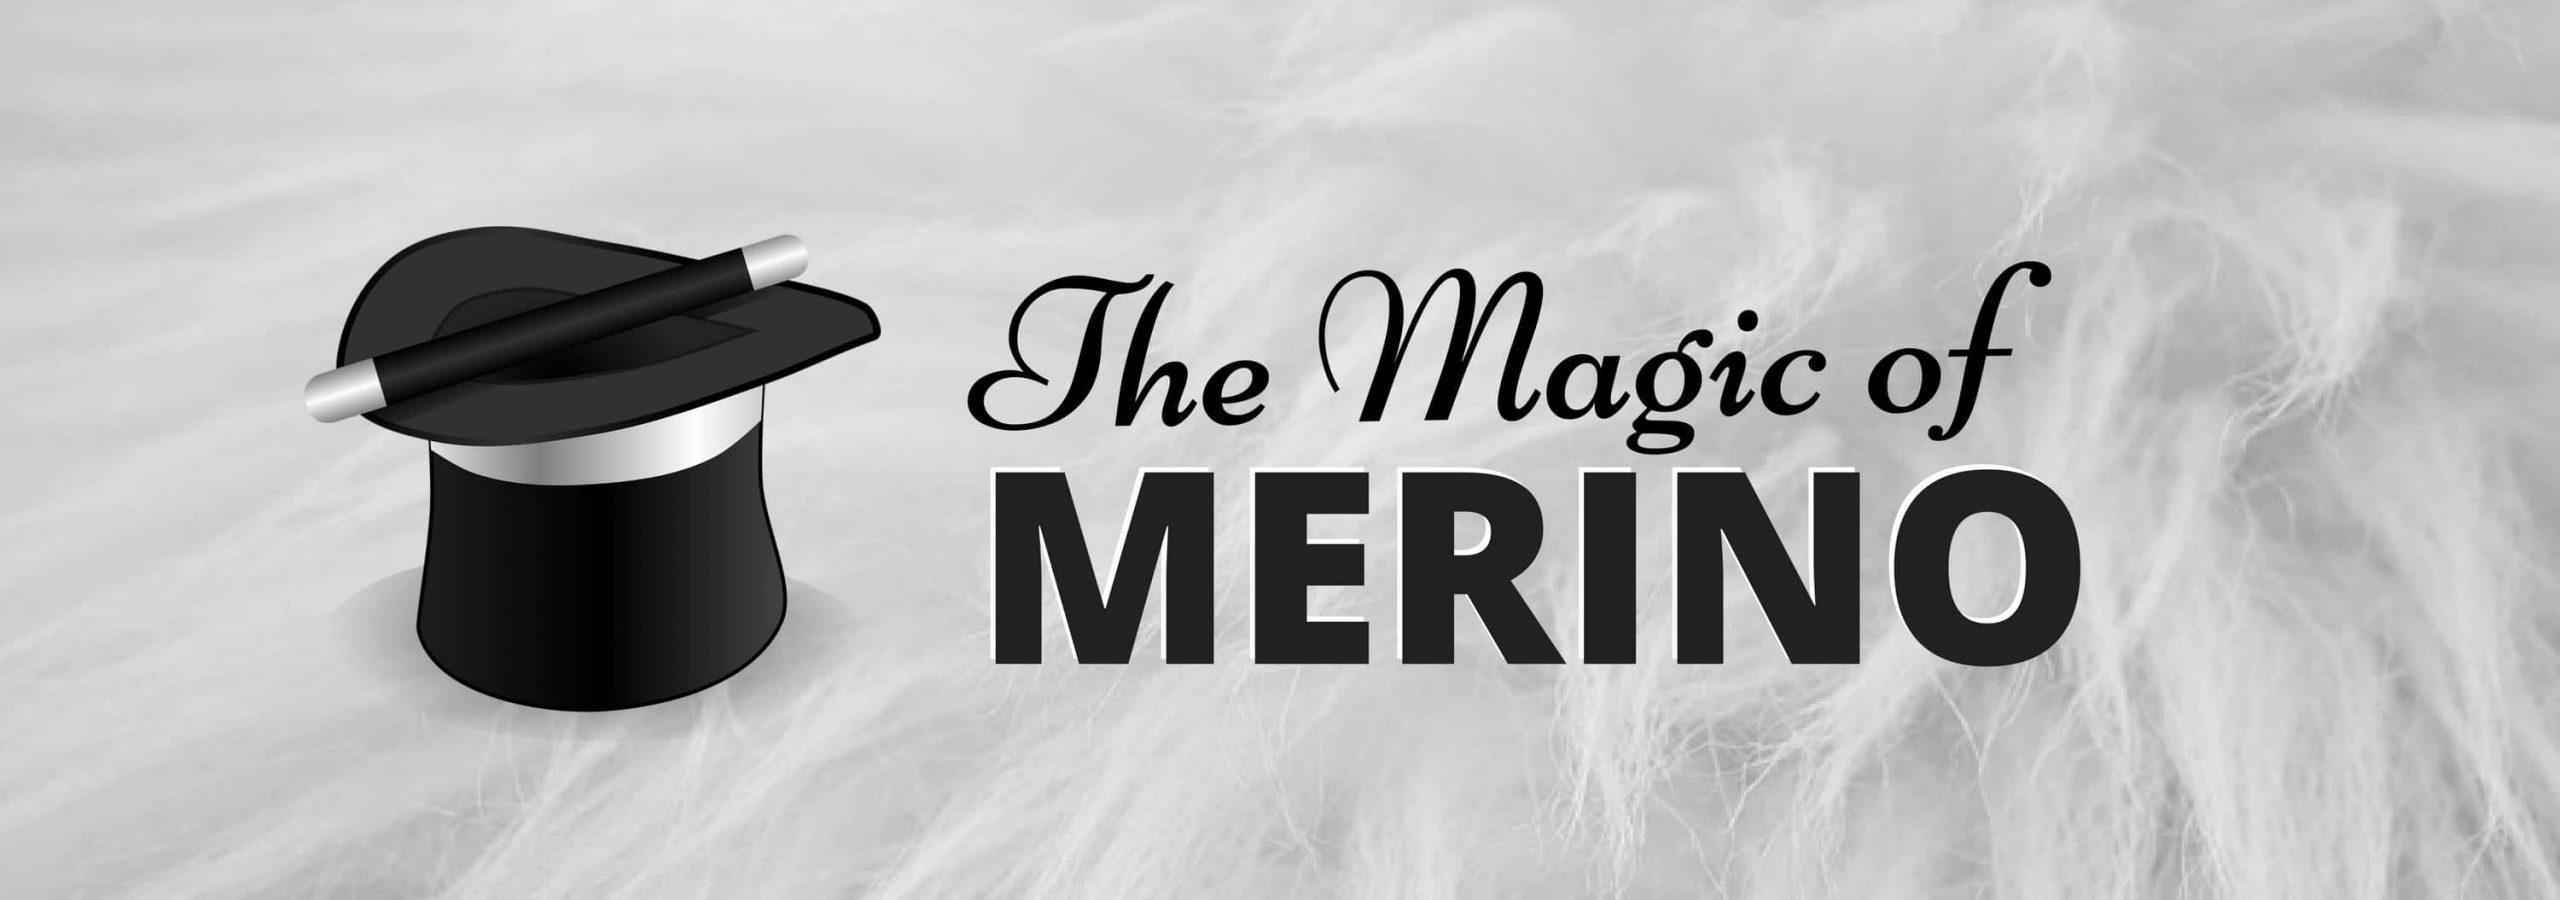 The Magic Of Our Merino